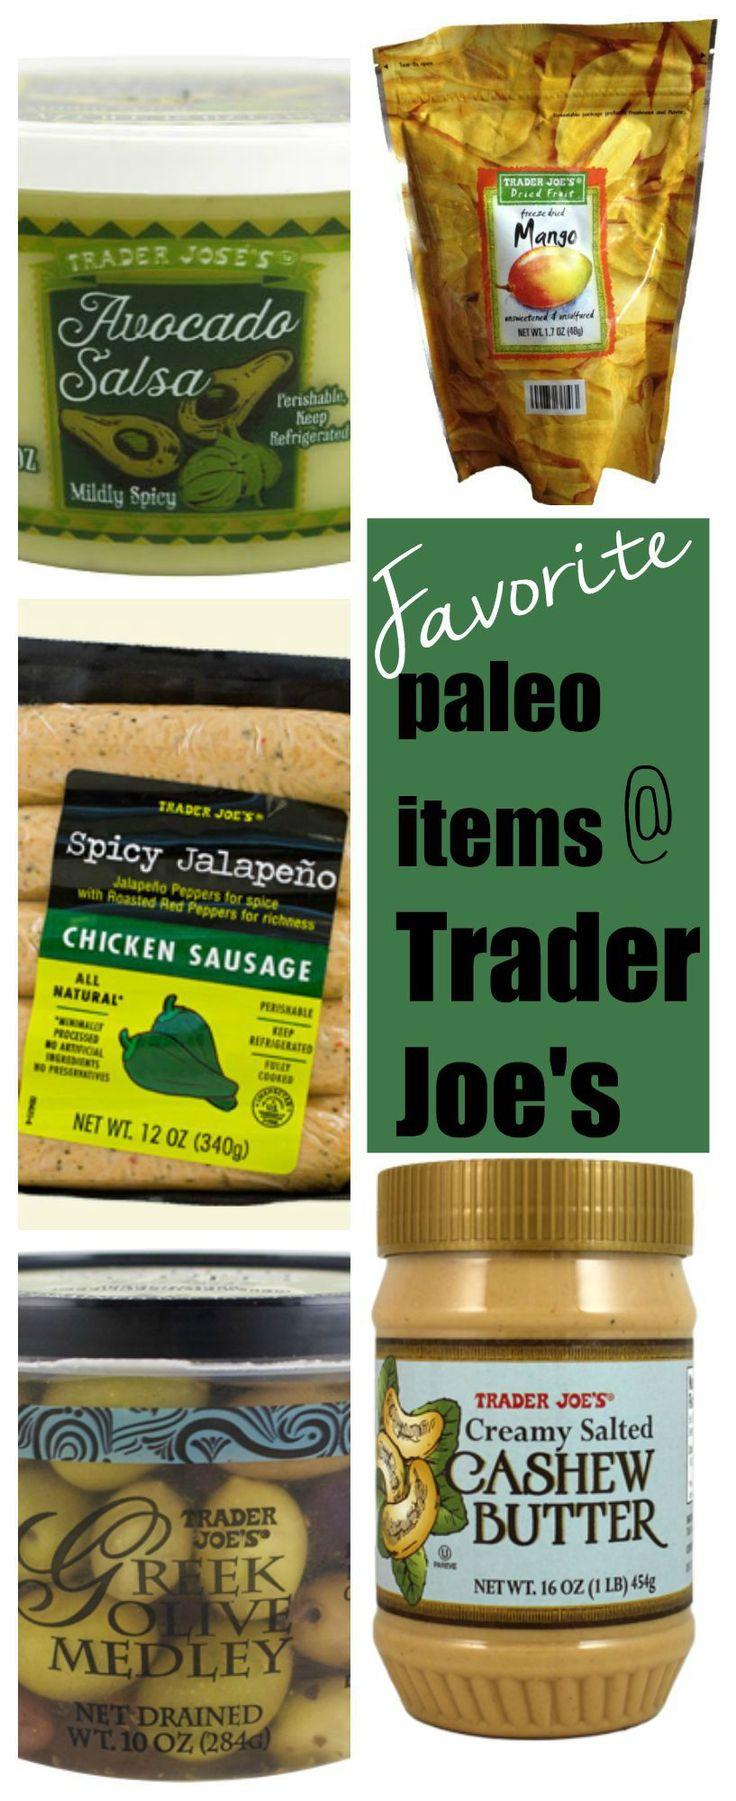 My favorite paleo/ Whole 30 products at Trader Joe's!